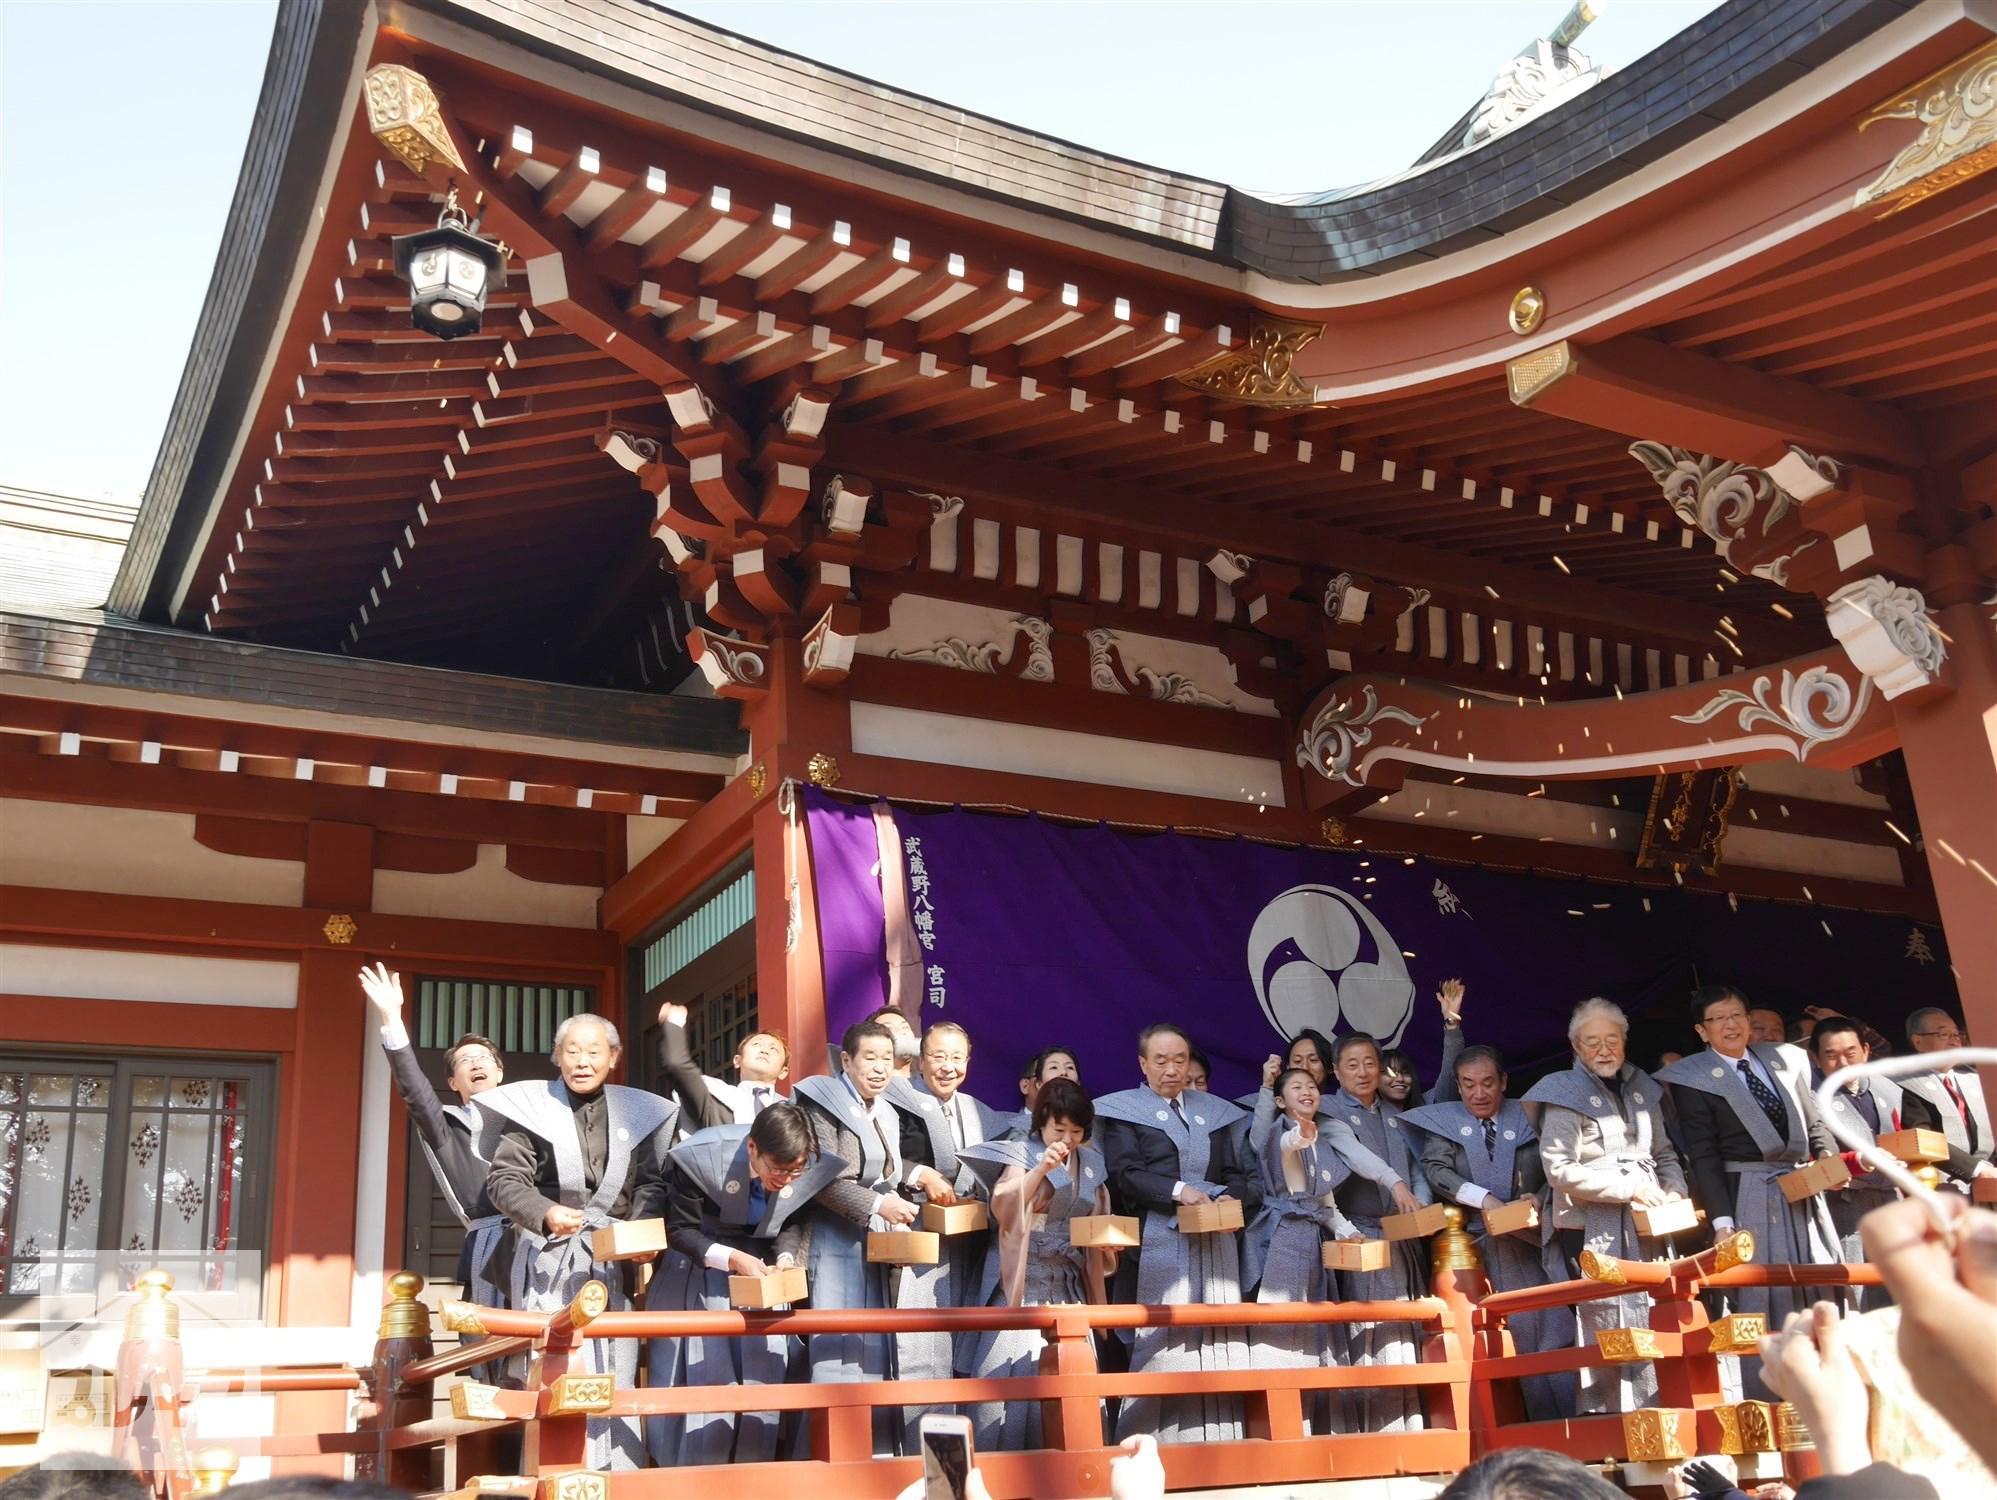 LA20190203-武蔵野八幡宮-節分祭 (20).jpg